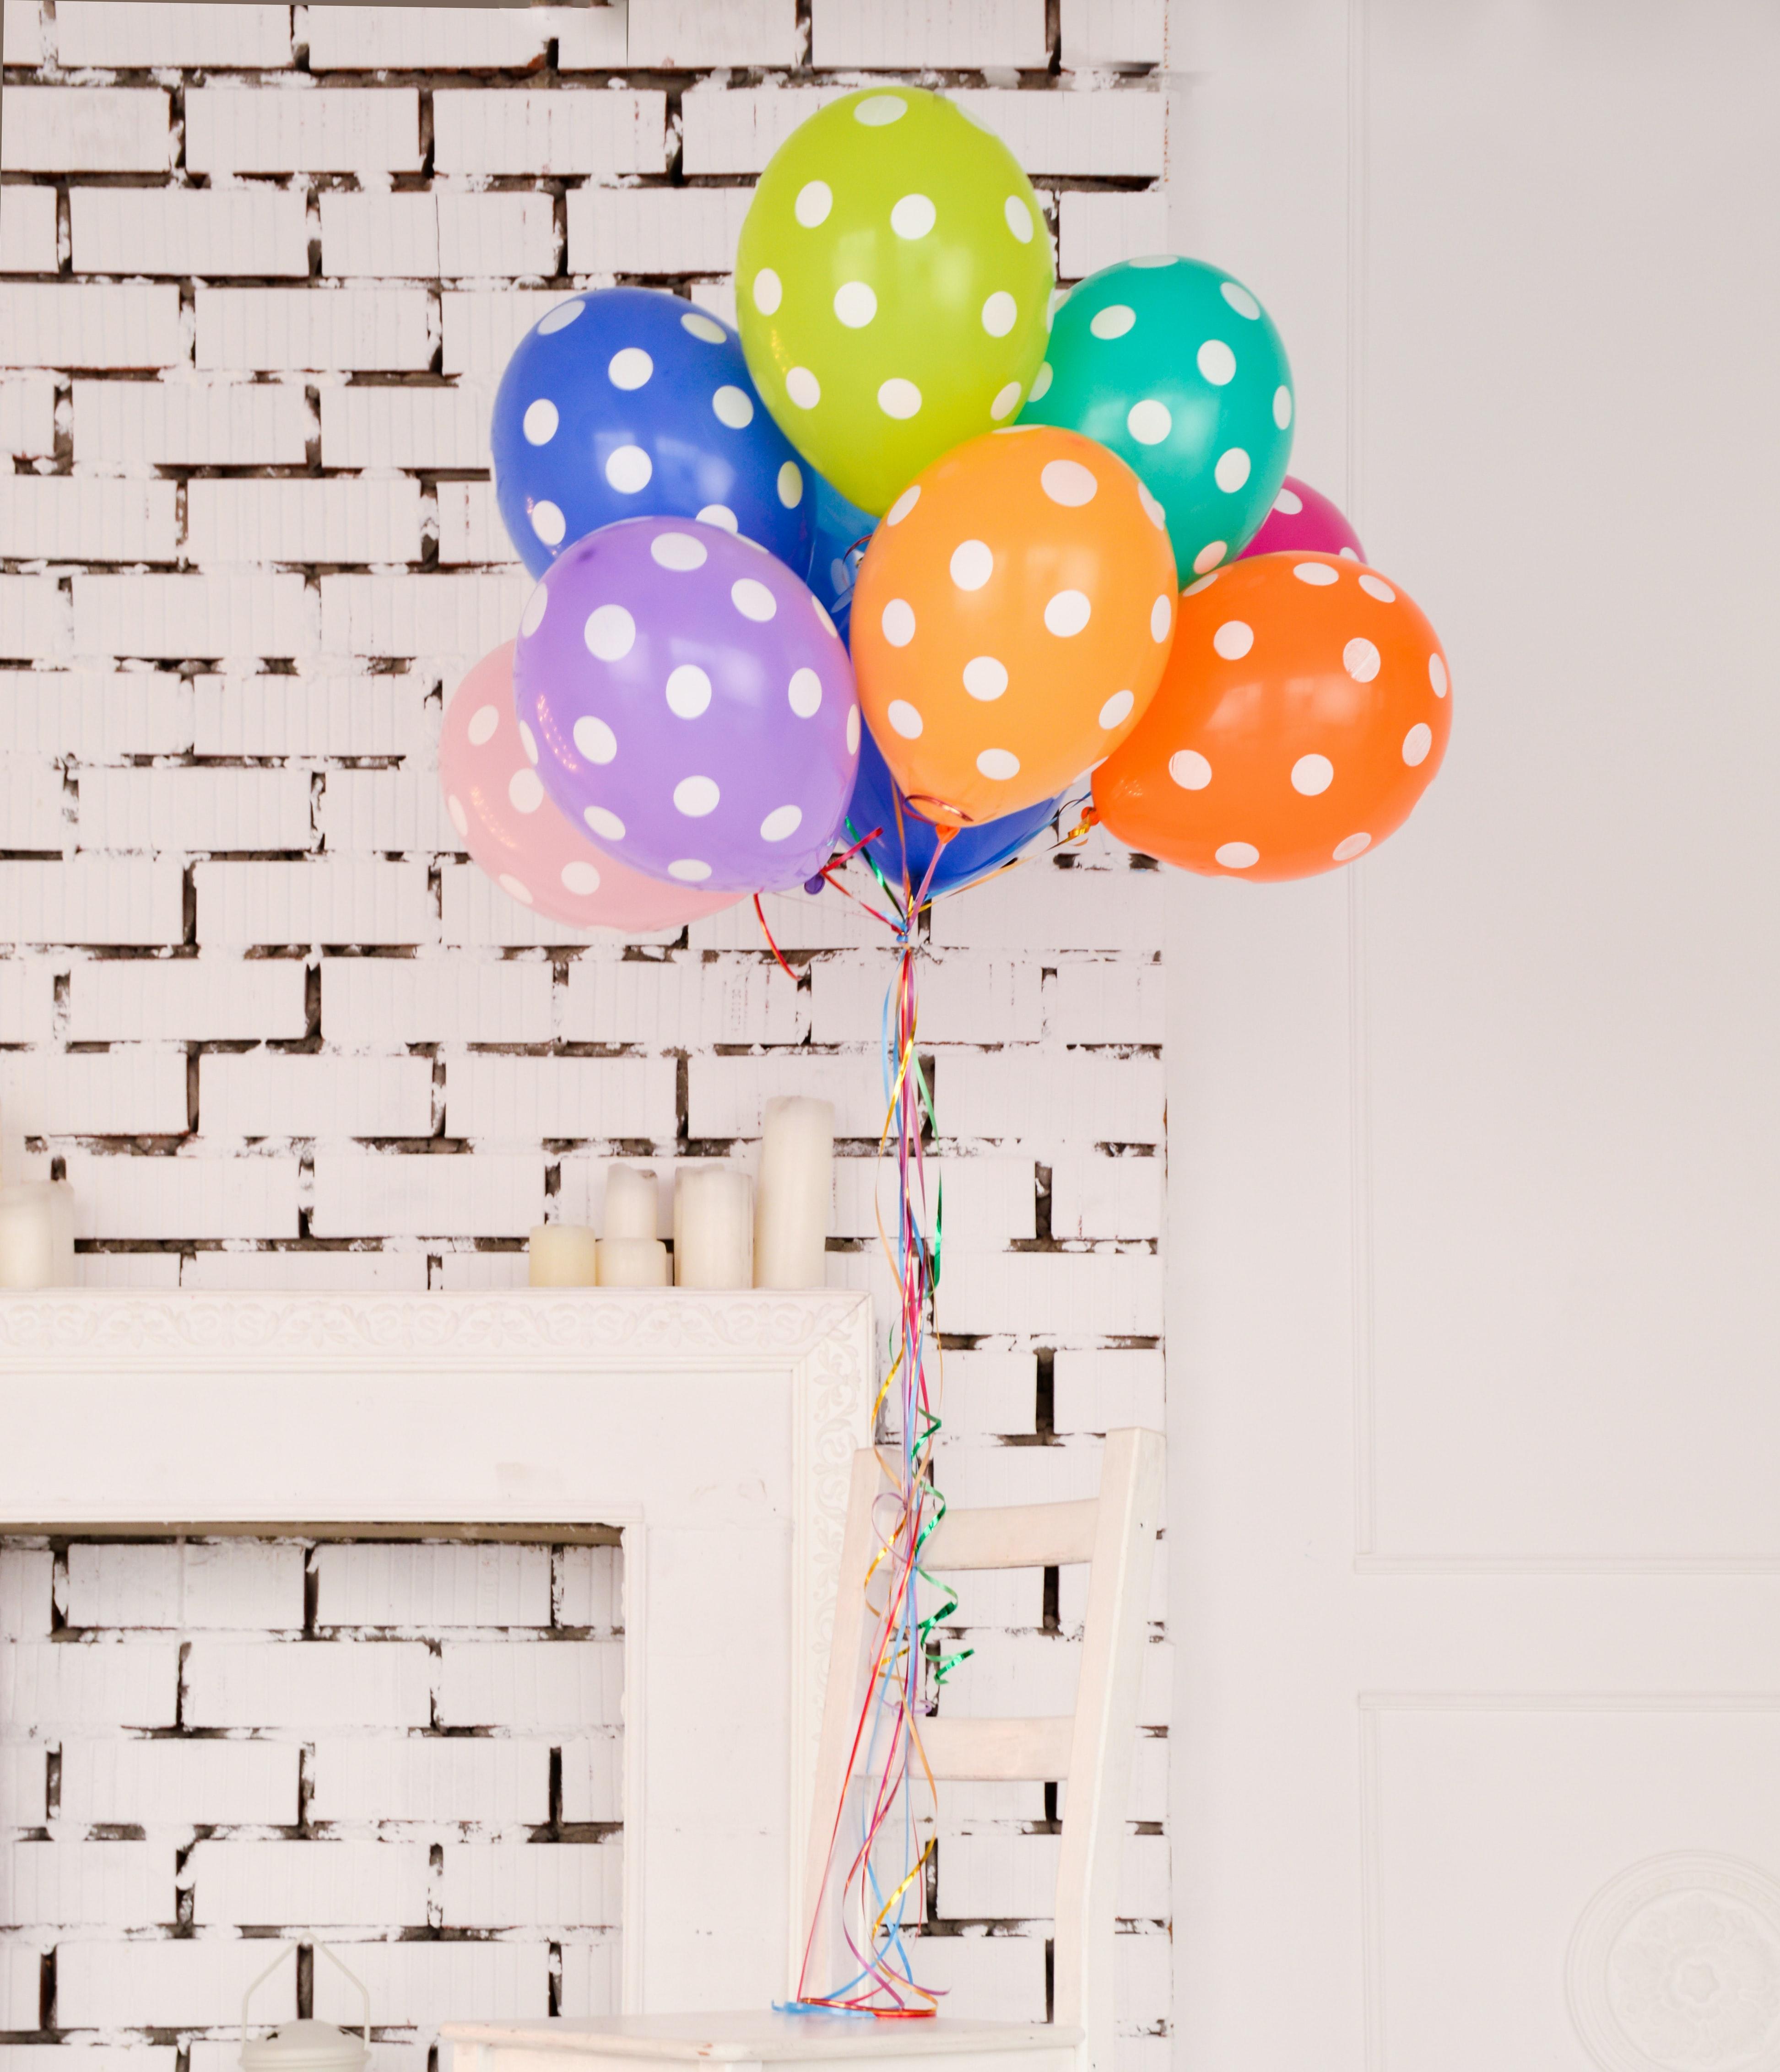 500 Happy Birthday Images Download The Perfect Birthday Photo On Unsplash